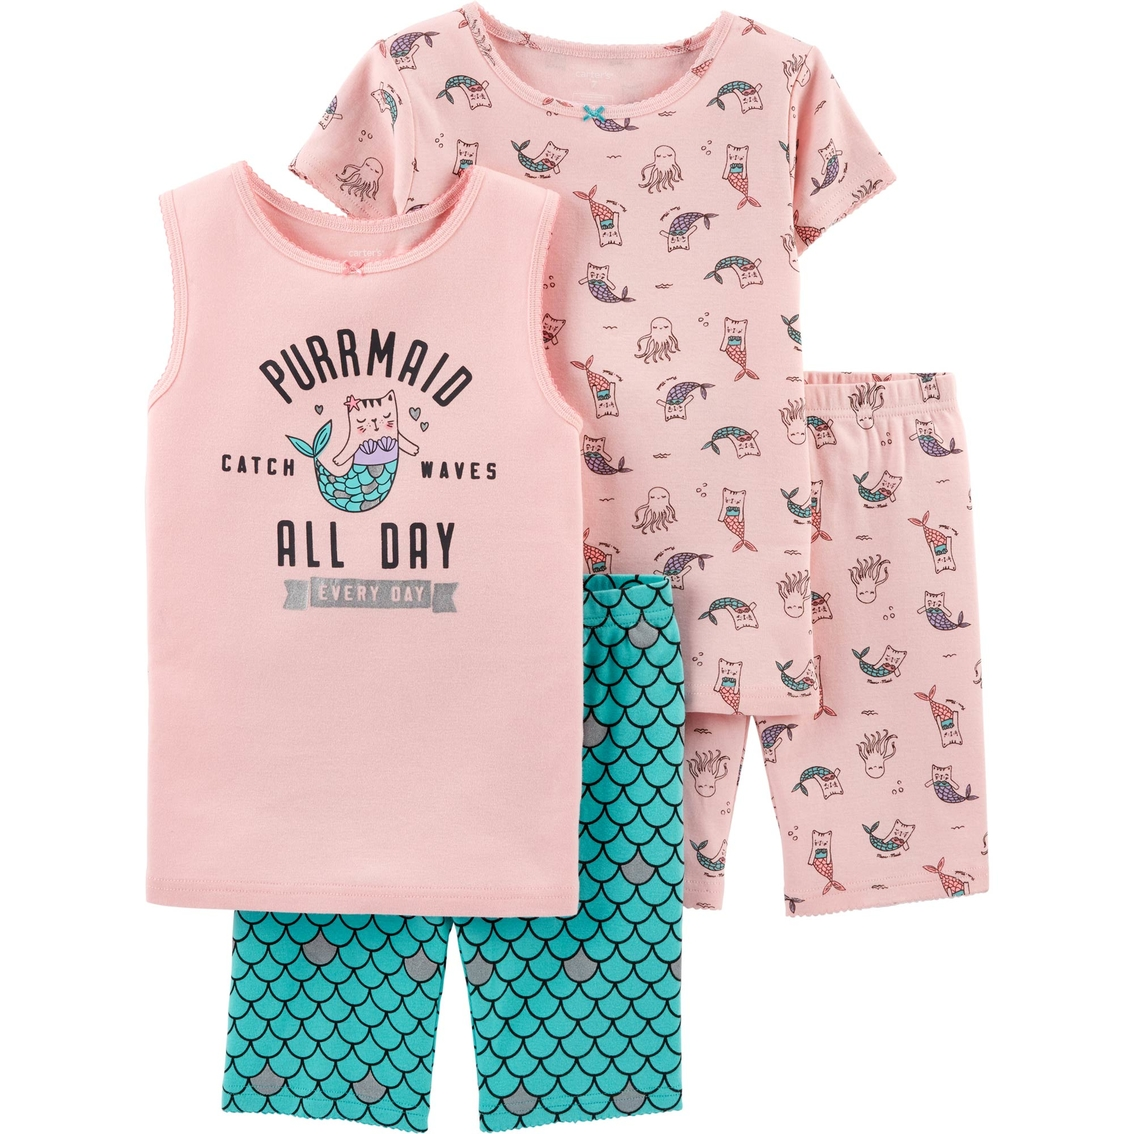 Mermaid Snug Fit Cotton Pajama Set Carters Girls 2T-16 4-Pc